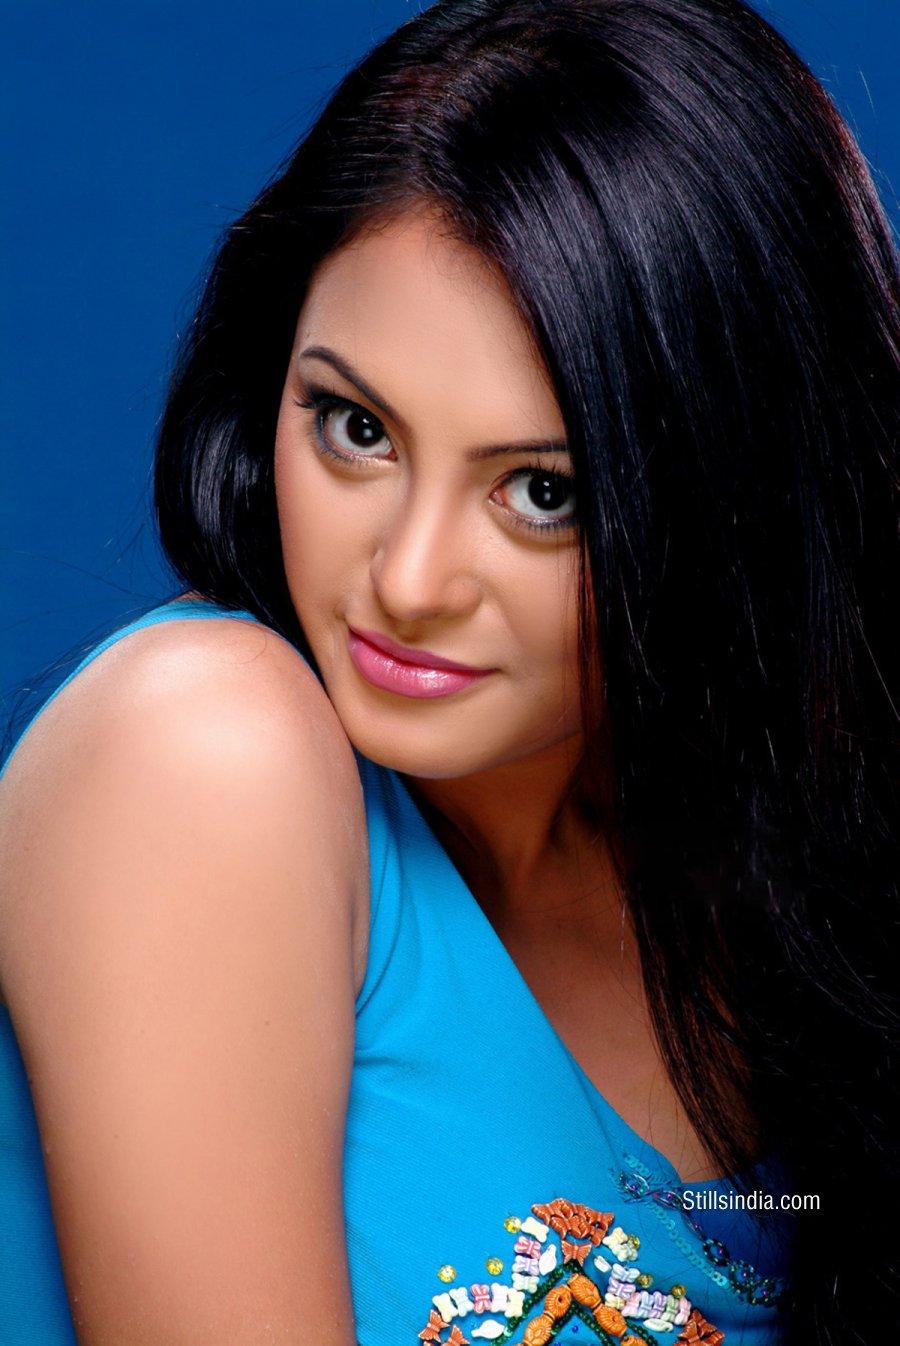 Actress Celebrities Photos Richa Gangopadhyay HD Hot in